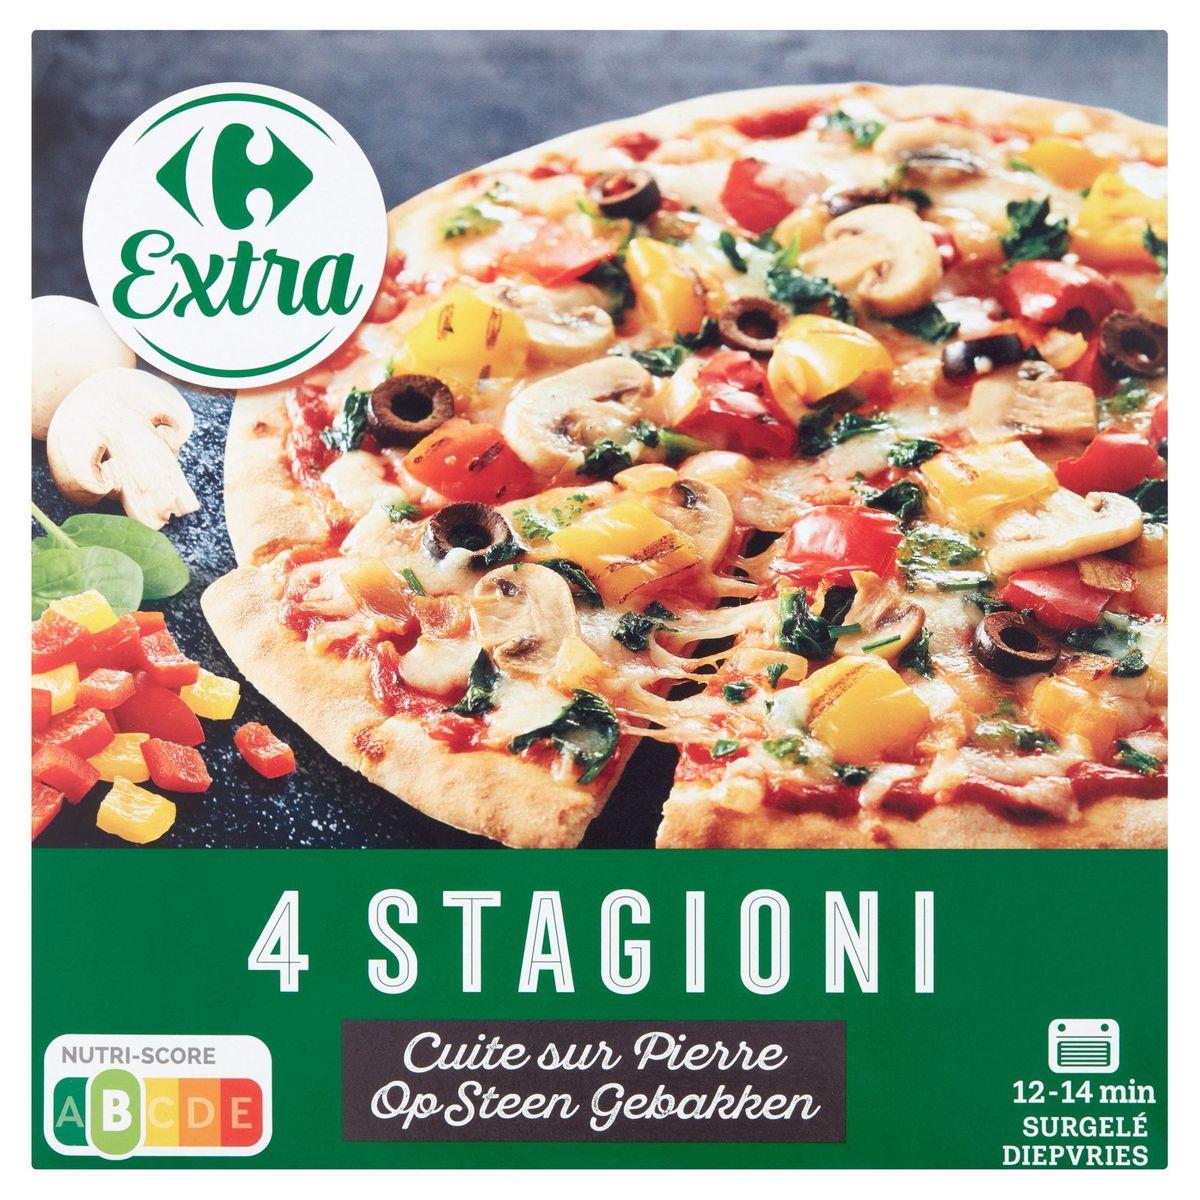 Carrefour Extra 4 Stagioni 400 g